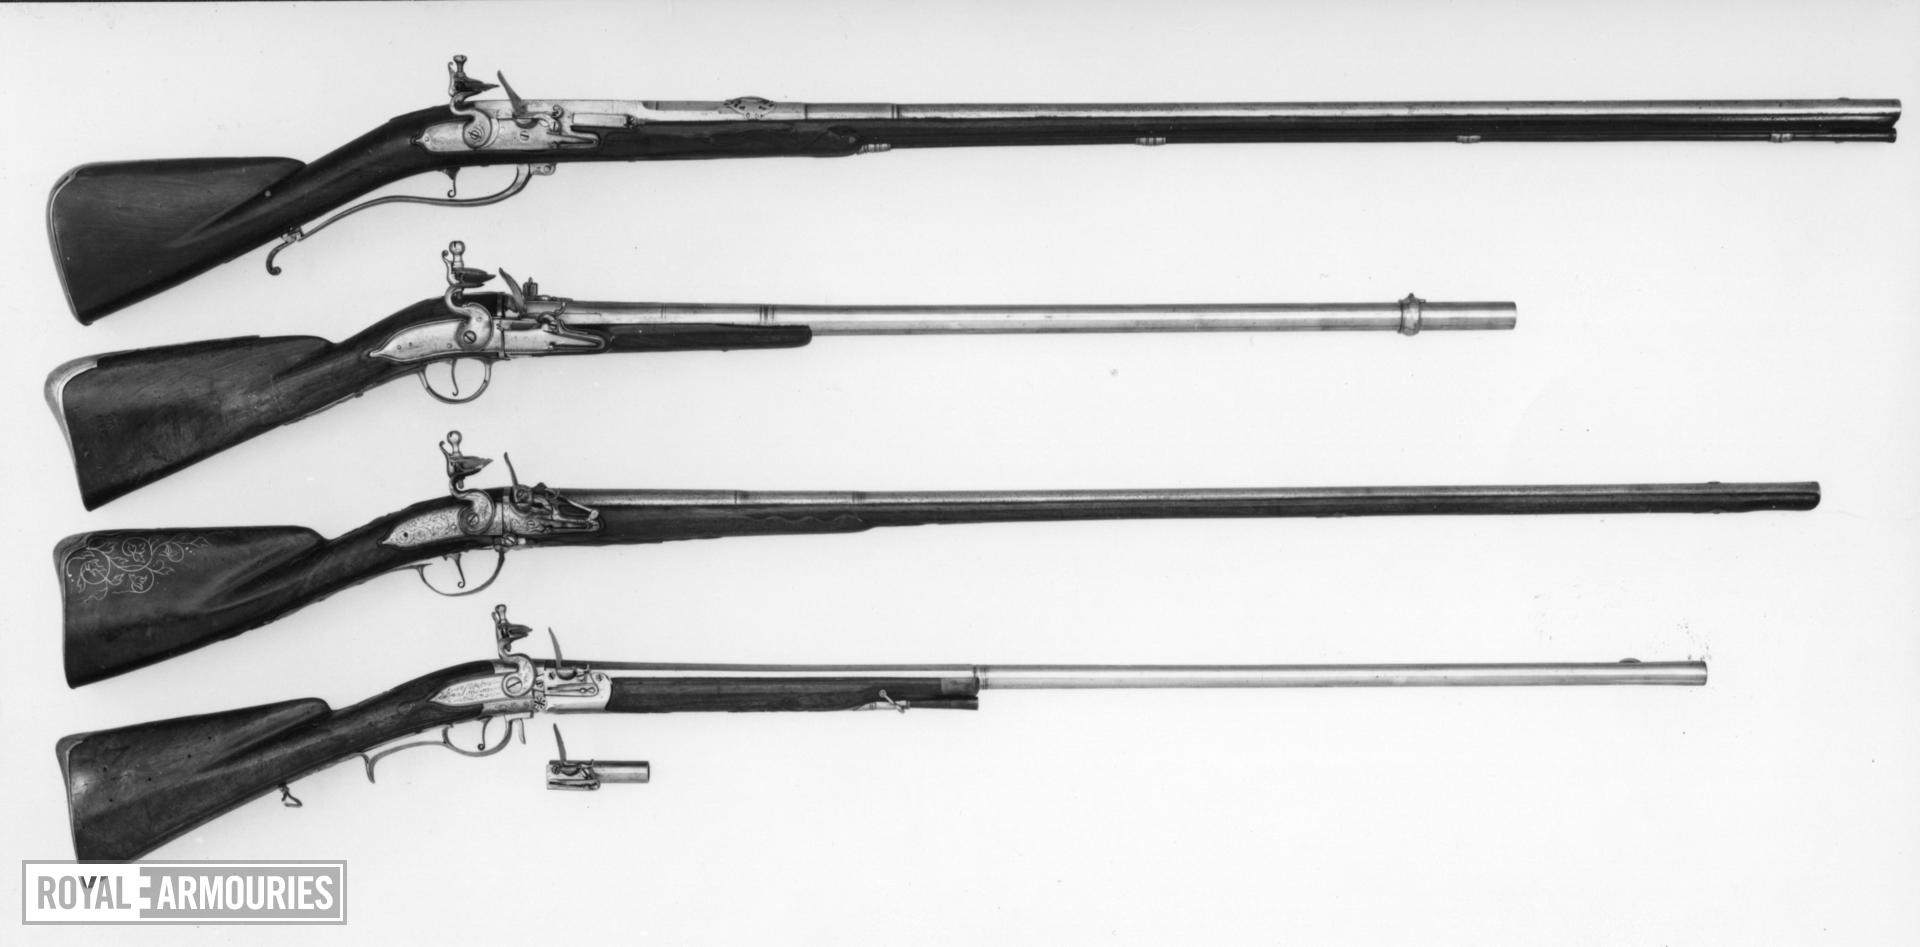 Flintlock breech-loading gun - N/A Sporting gun with removeable chambers